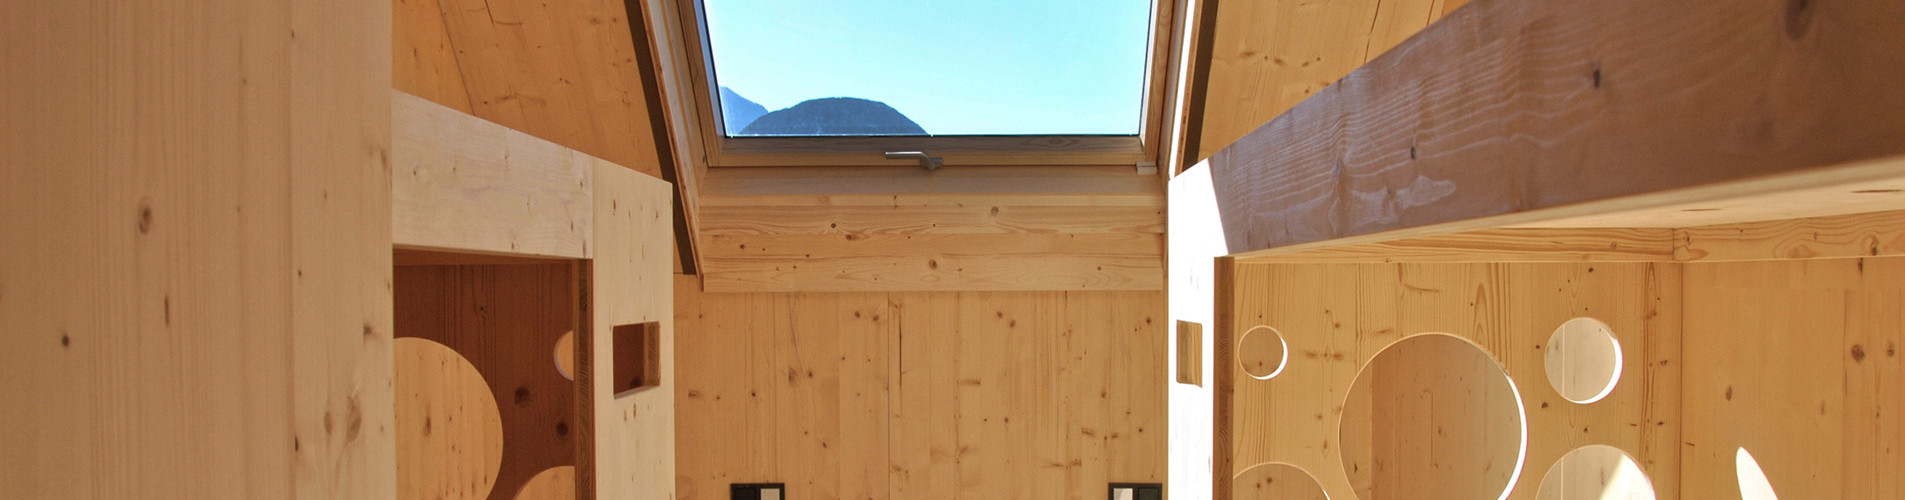 Franz-Fischer-Hütte, copyright Architextur Lüftenegger